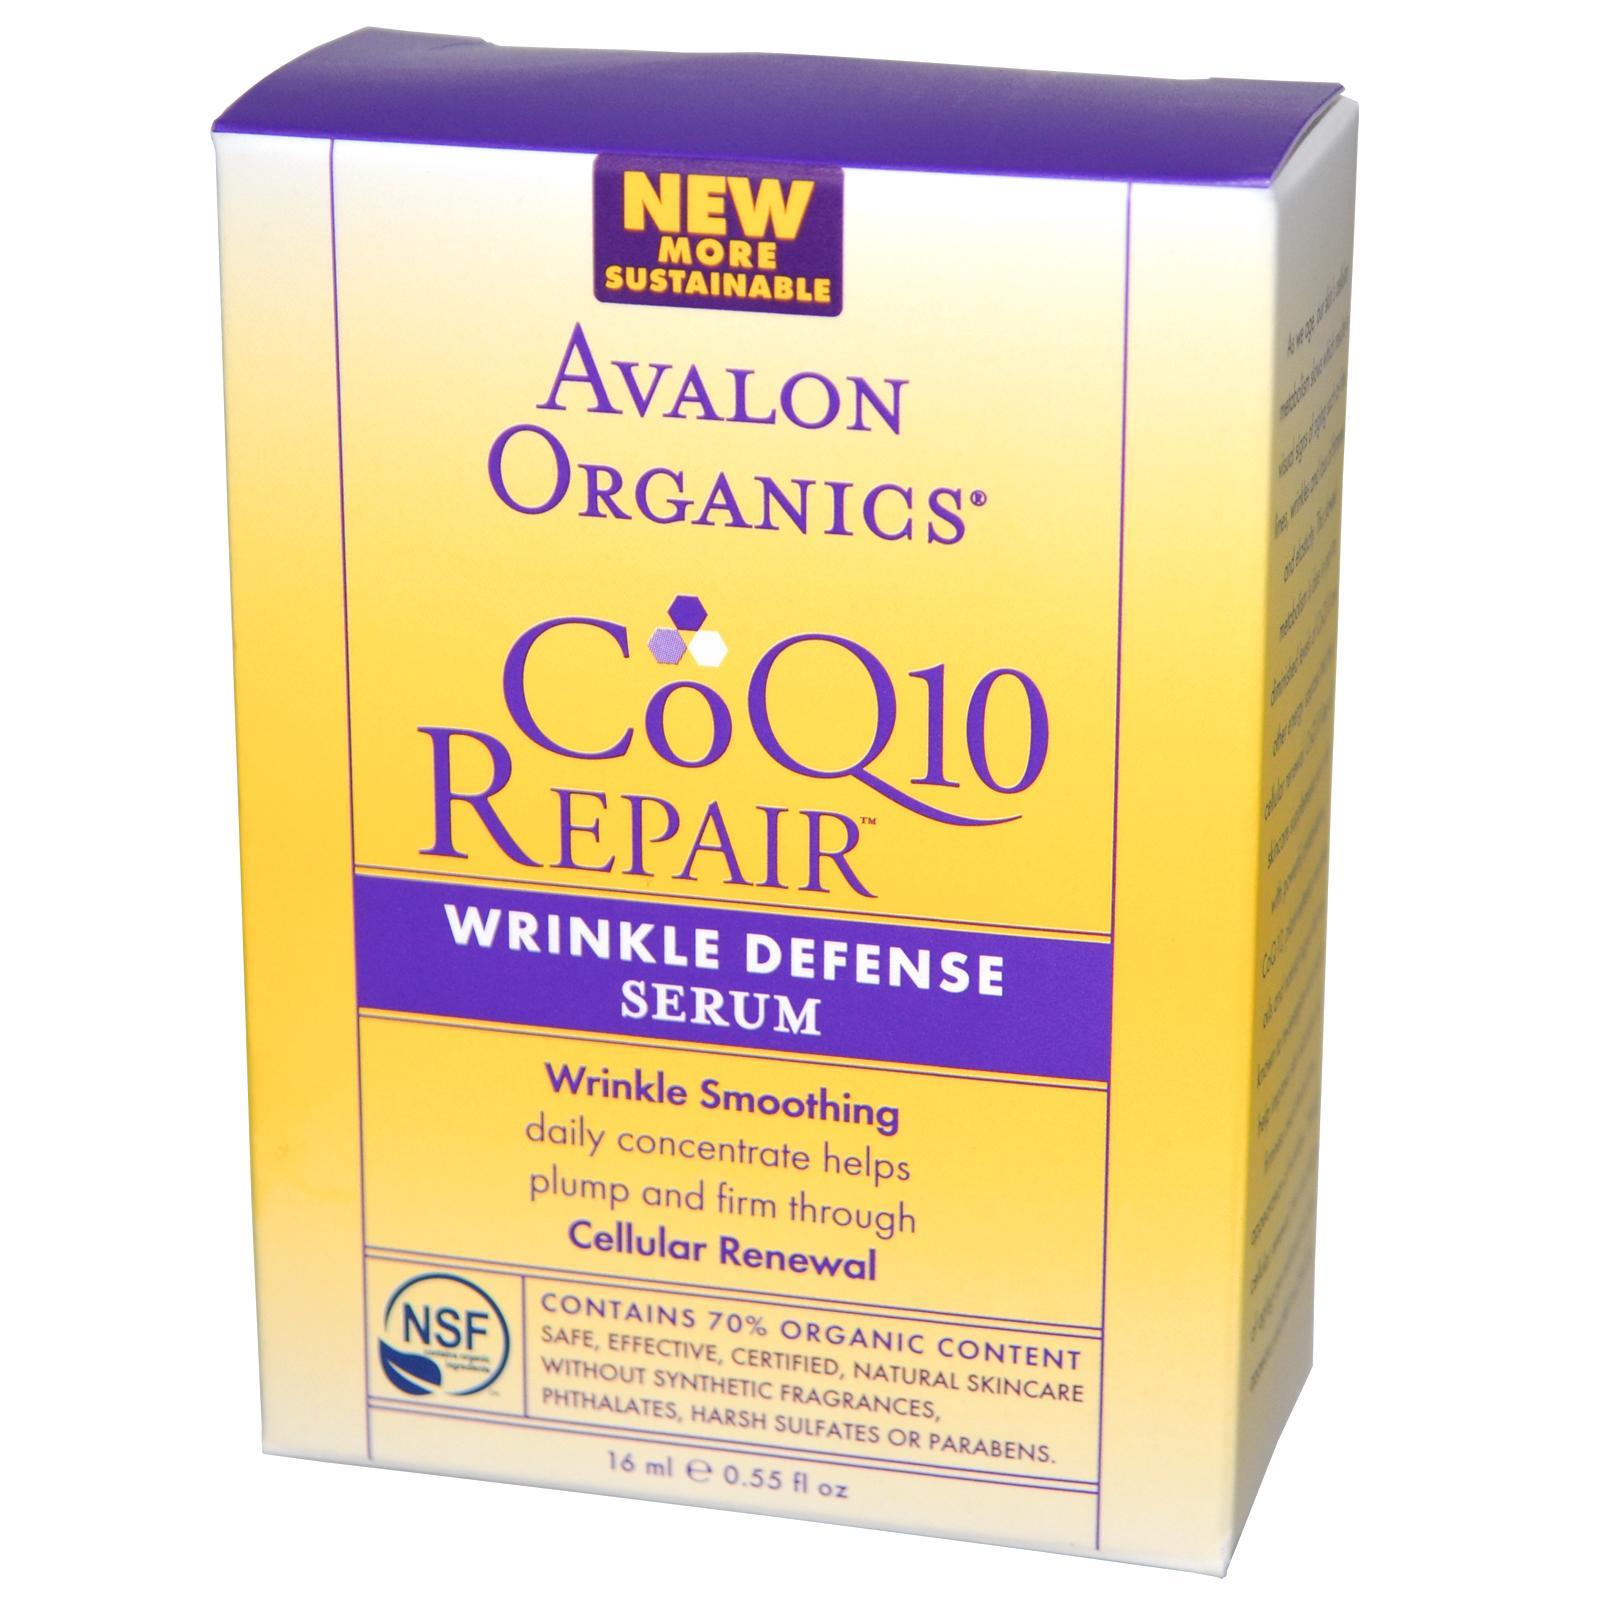 Avalon Organics Coq10 Wrink Serum (1x055OZ )